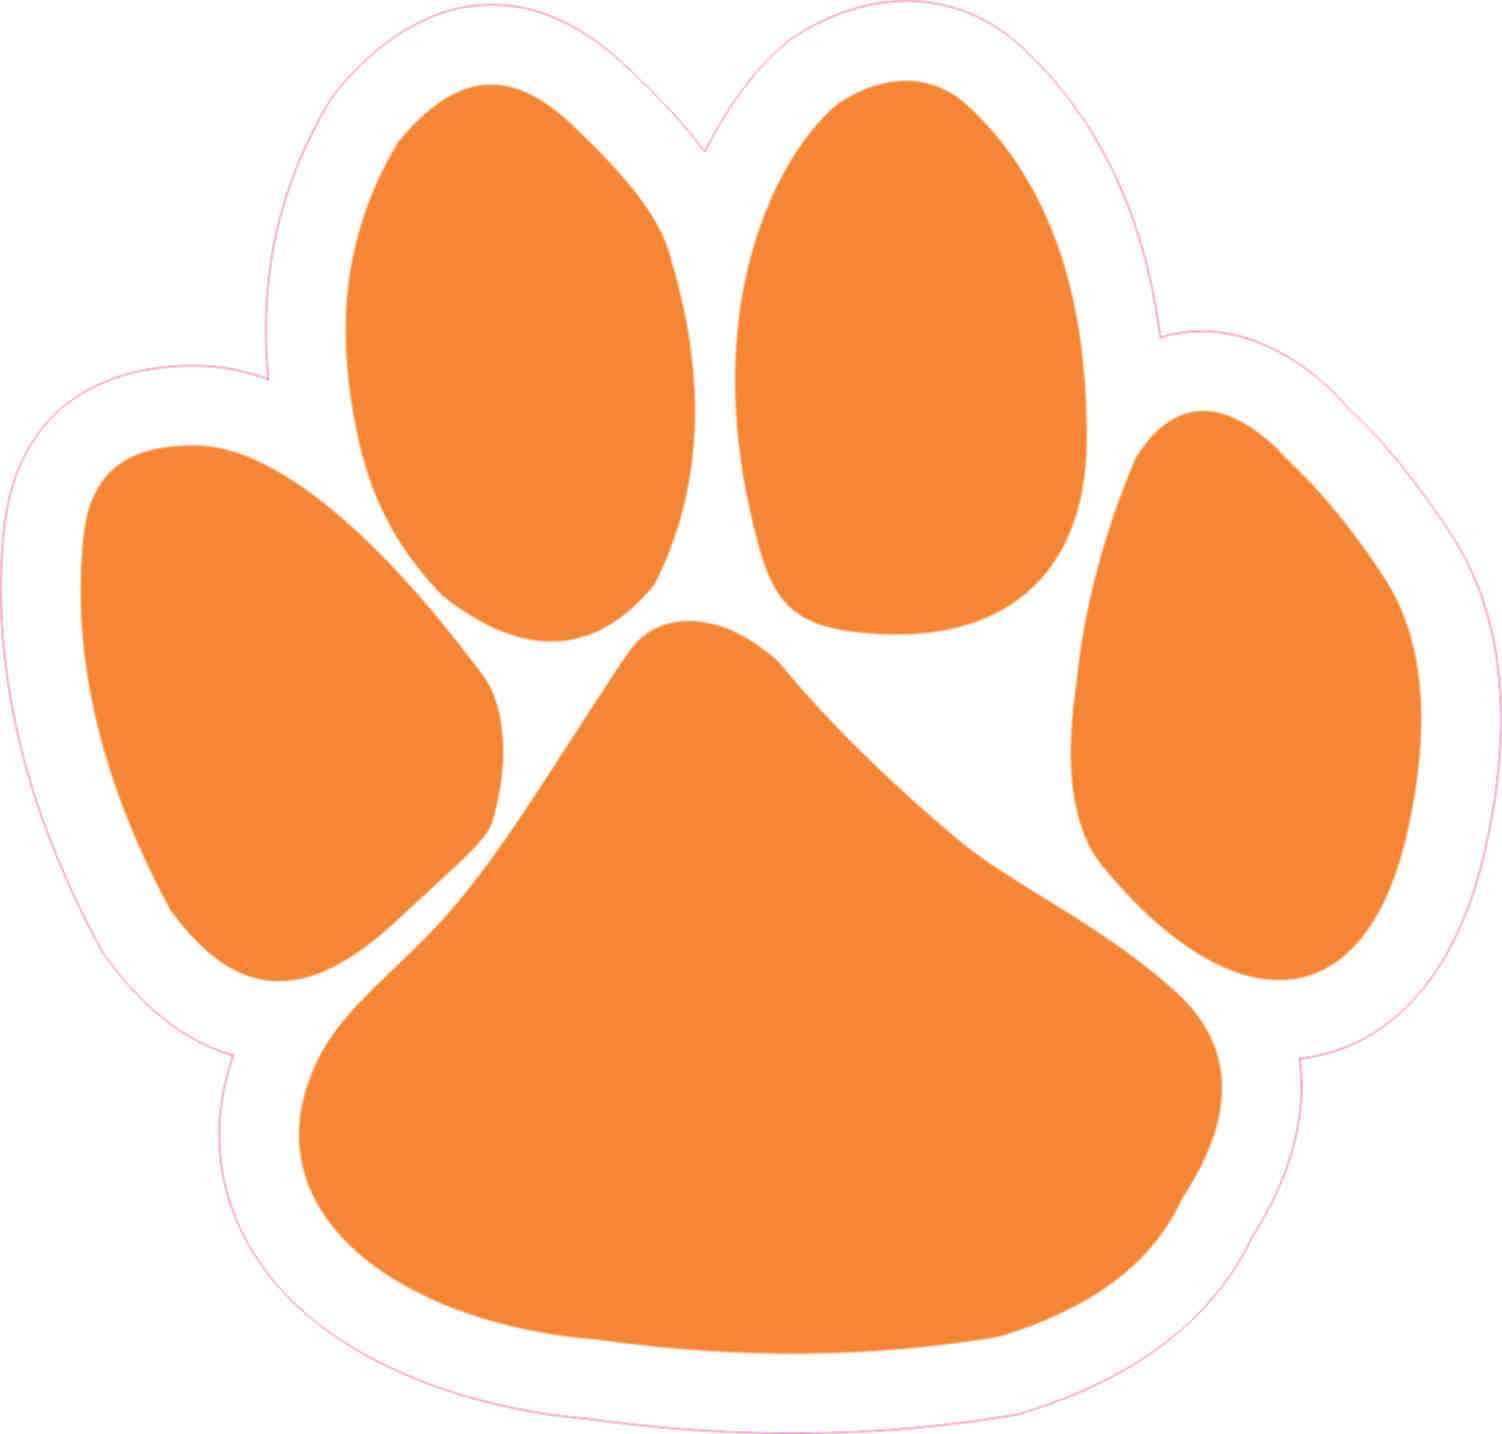 4.75in x 5in Orange Paw Print Bumper Sticker Vinyl Car Window Mascot Decal  - Walmart.com - Walmart.com